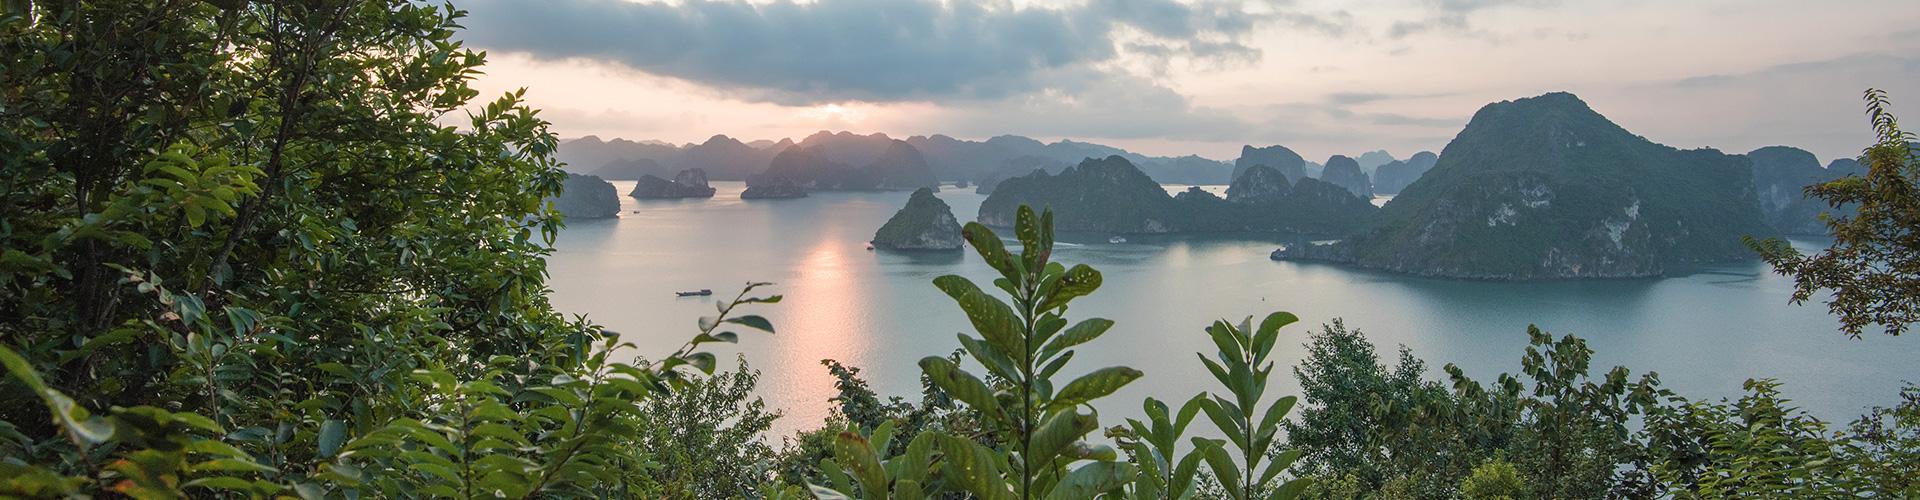 716bba02142 Scenic Vietnam - Southall Travel